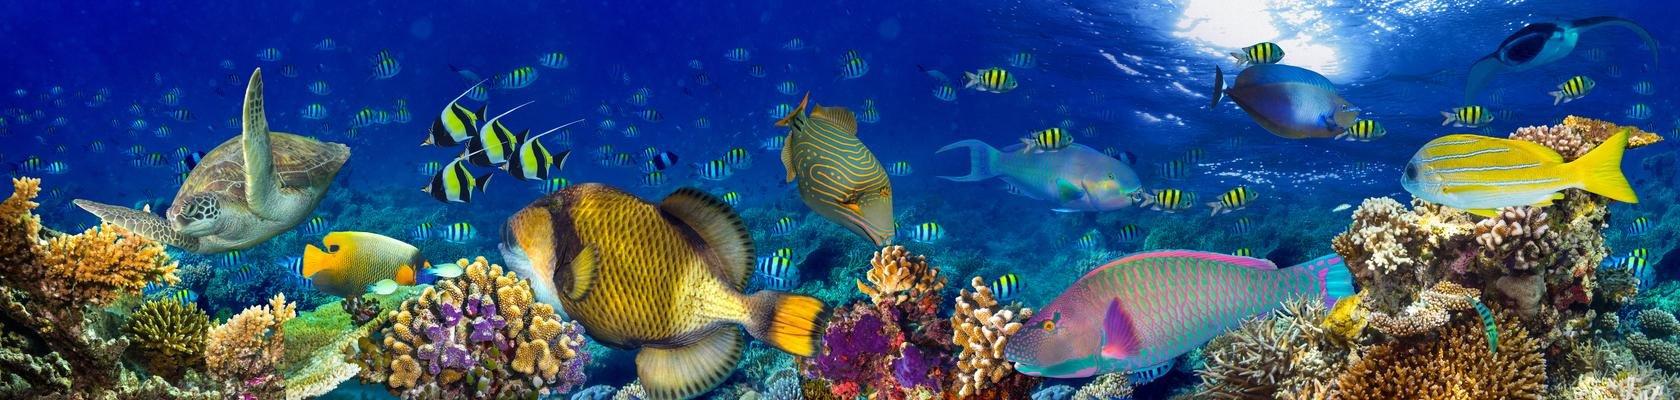 Onderwaterwereld bij Pemuteran